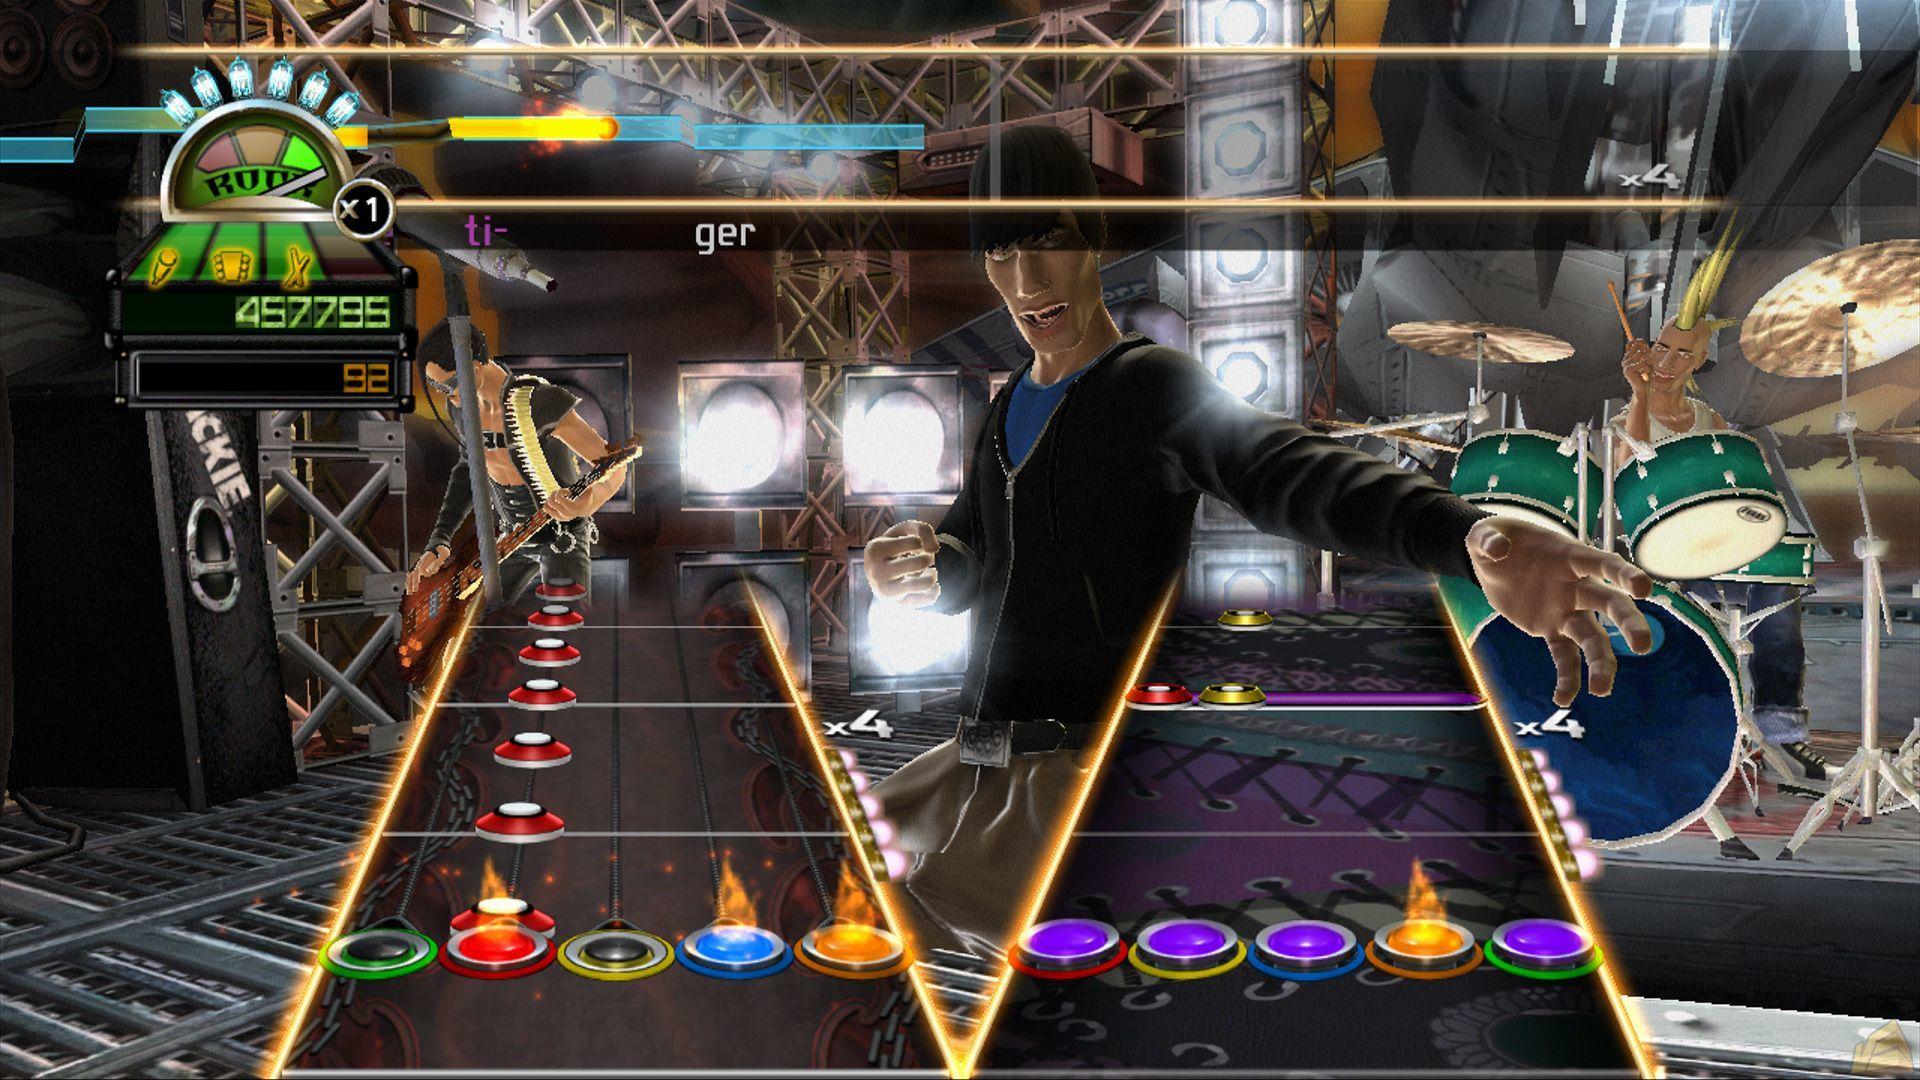 guitar-hero-world-tour-screenshot-two-player-rifts